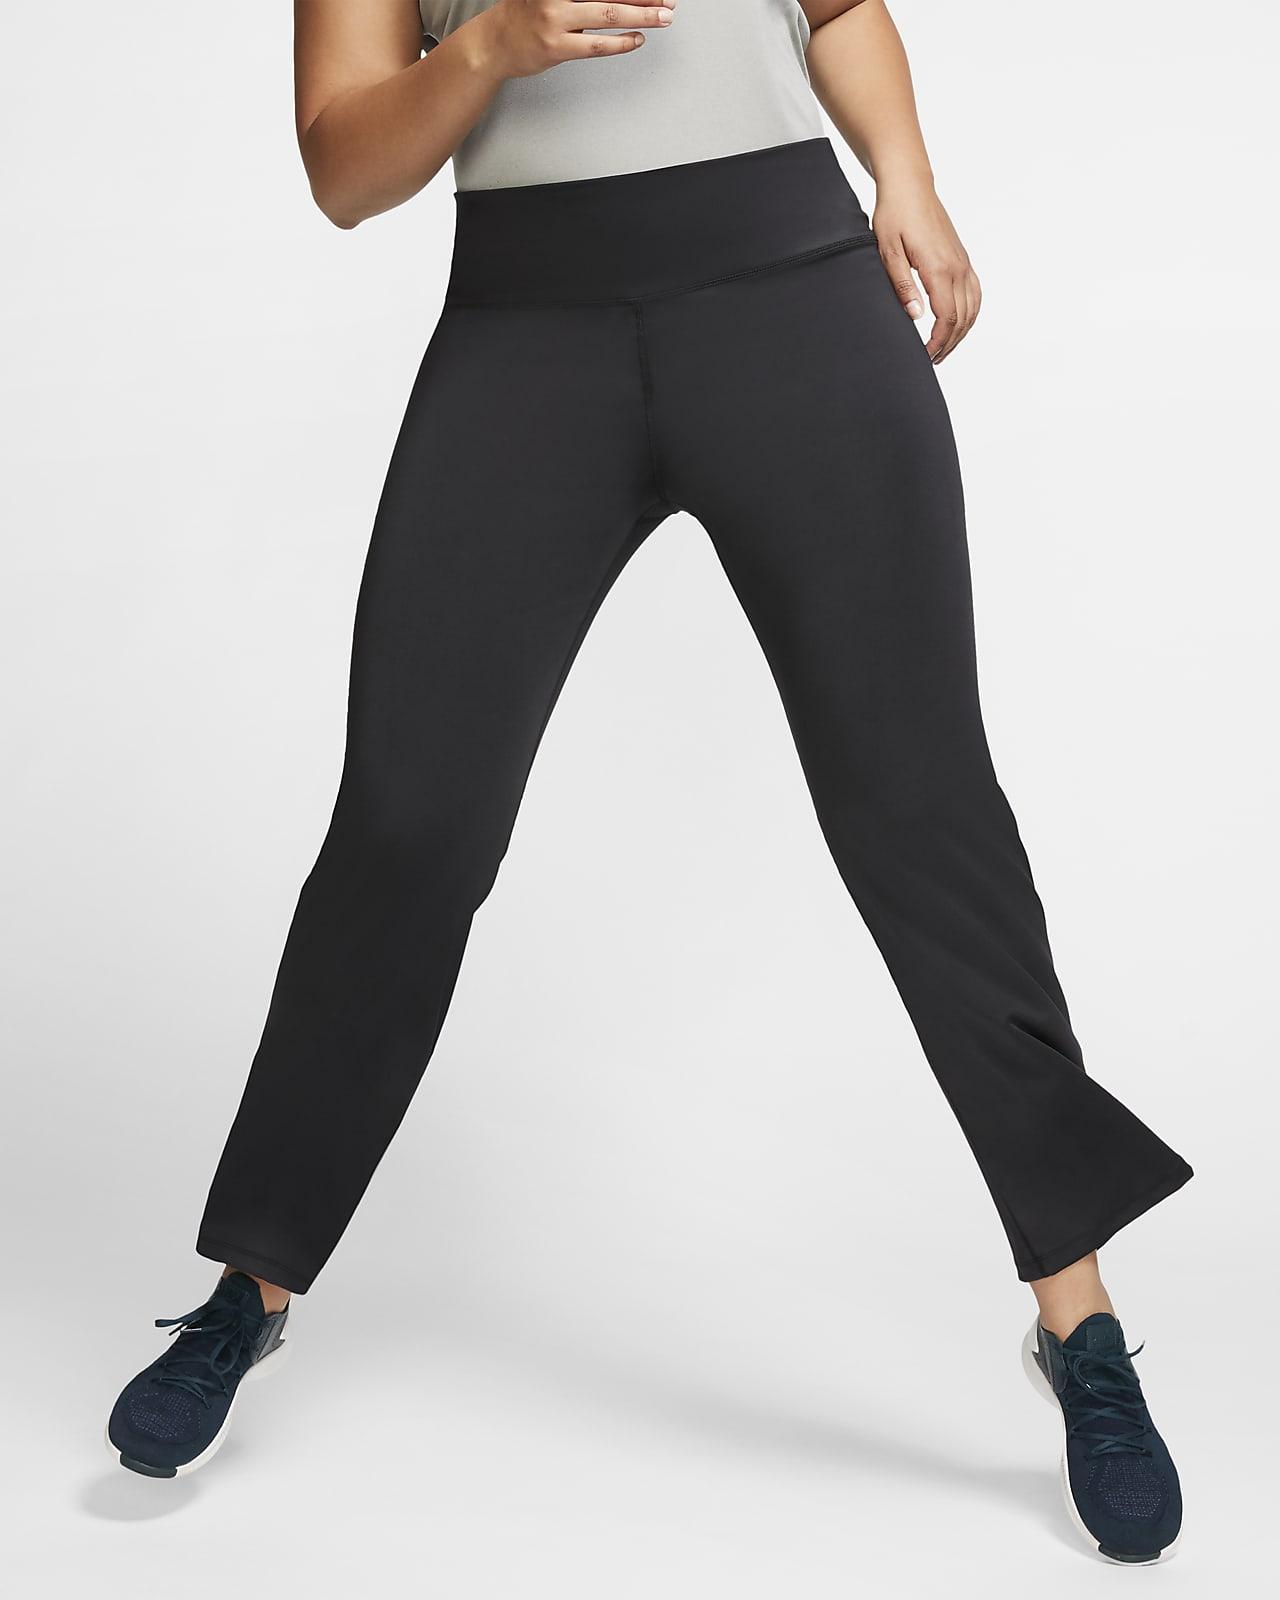 Nike Power Damen Trainingshose (große Größe)